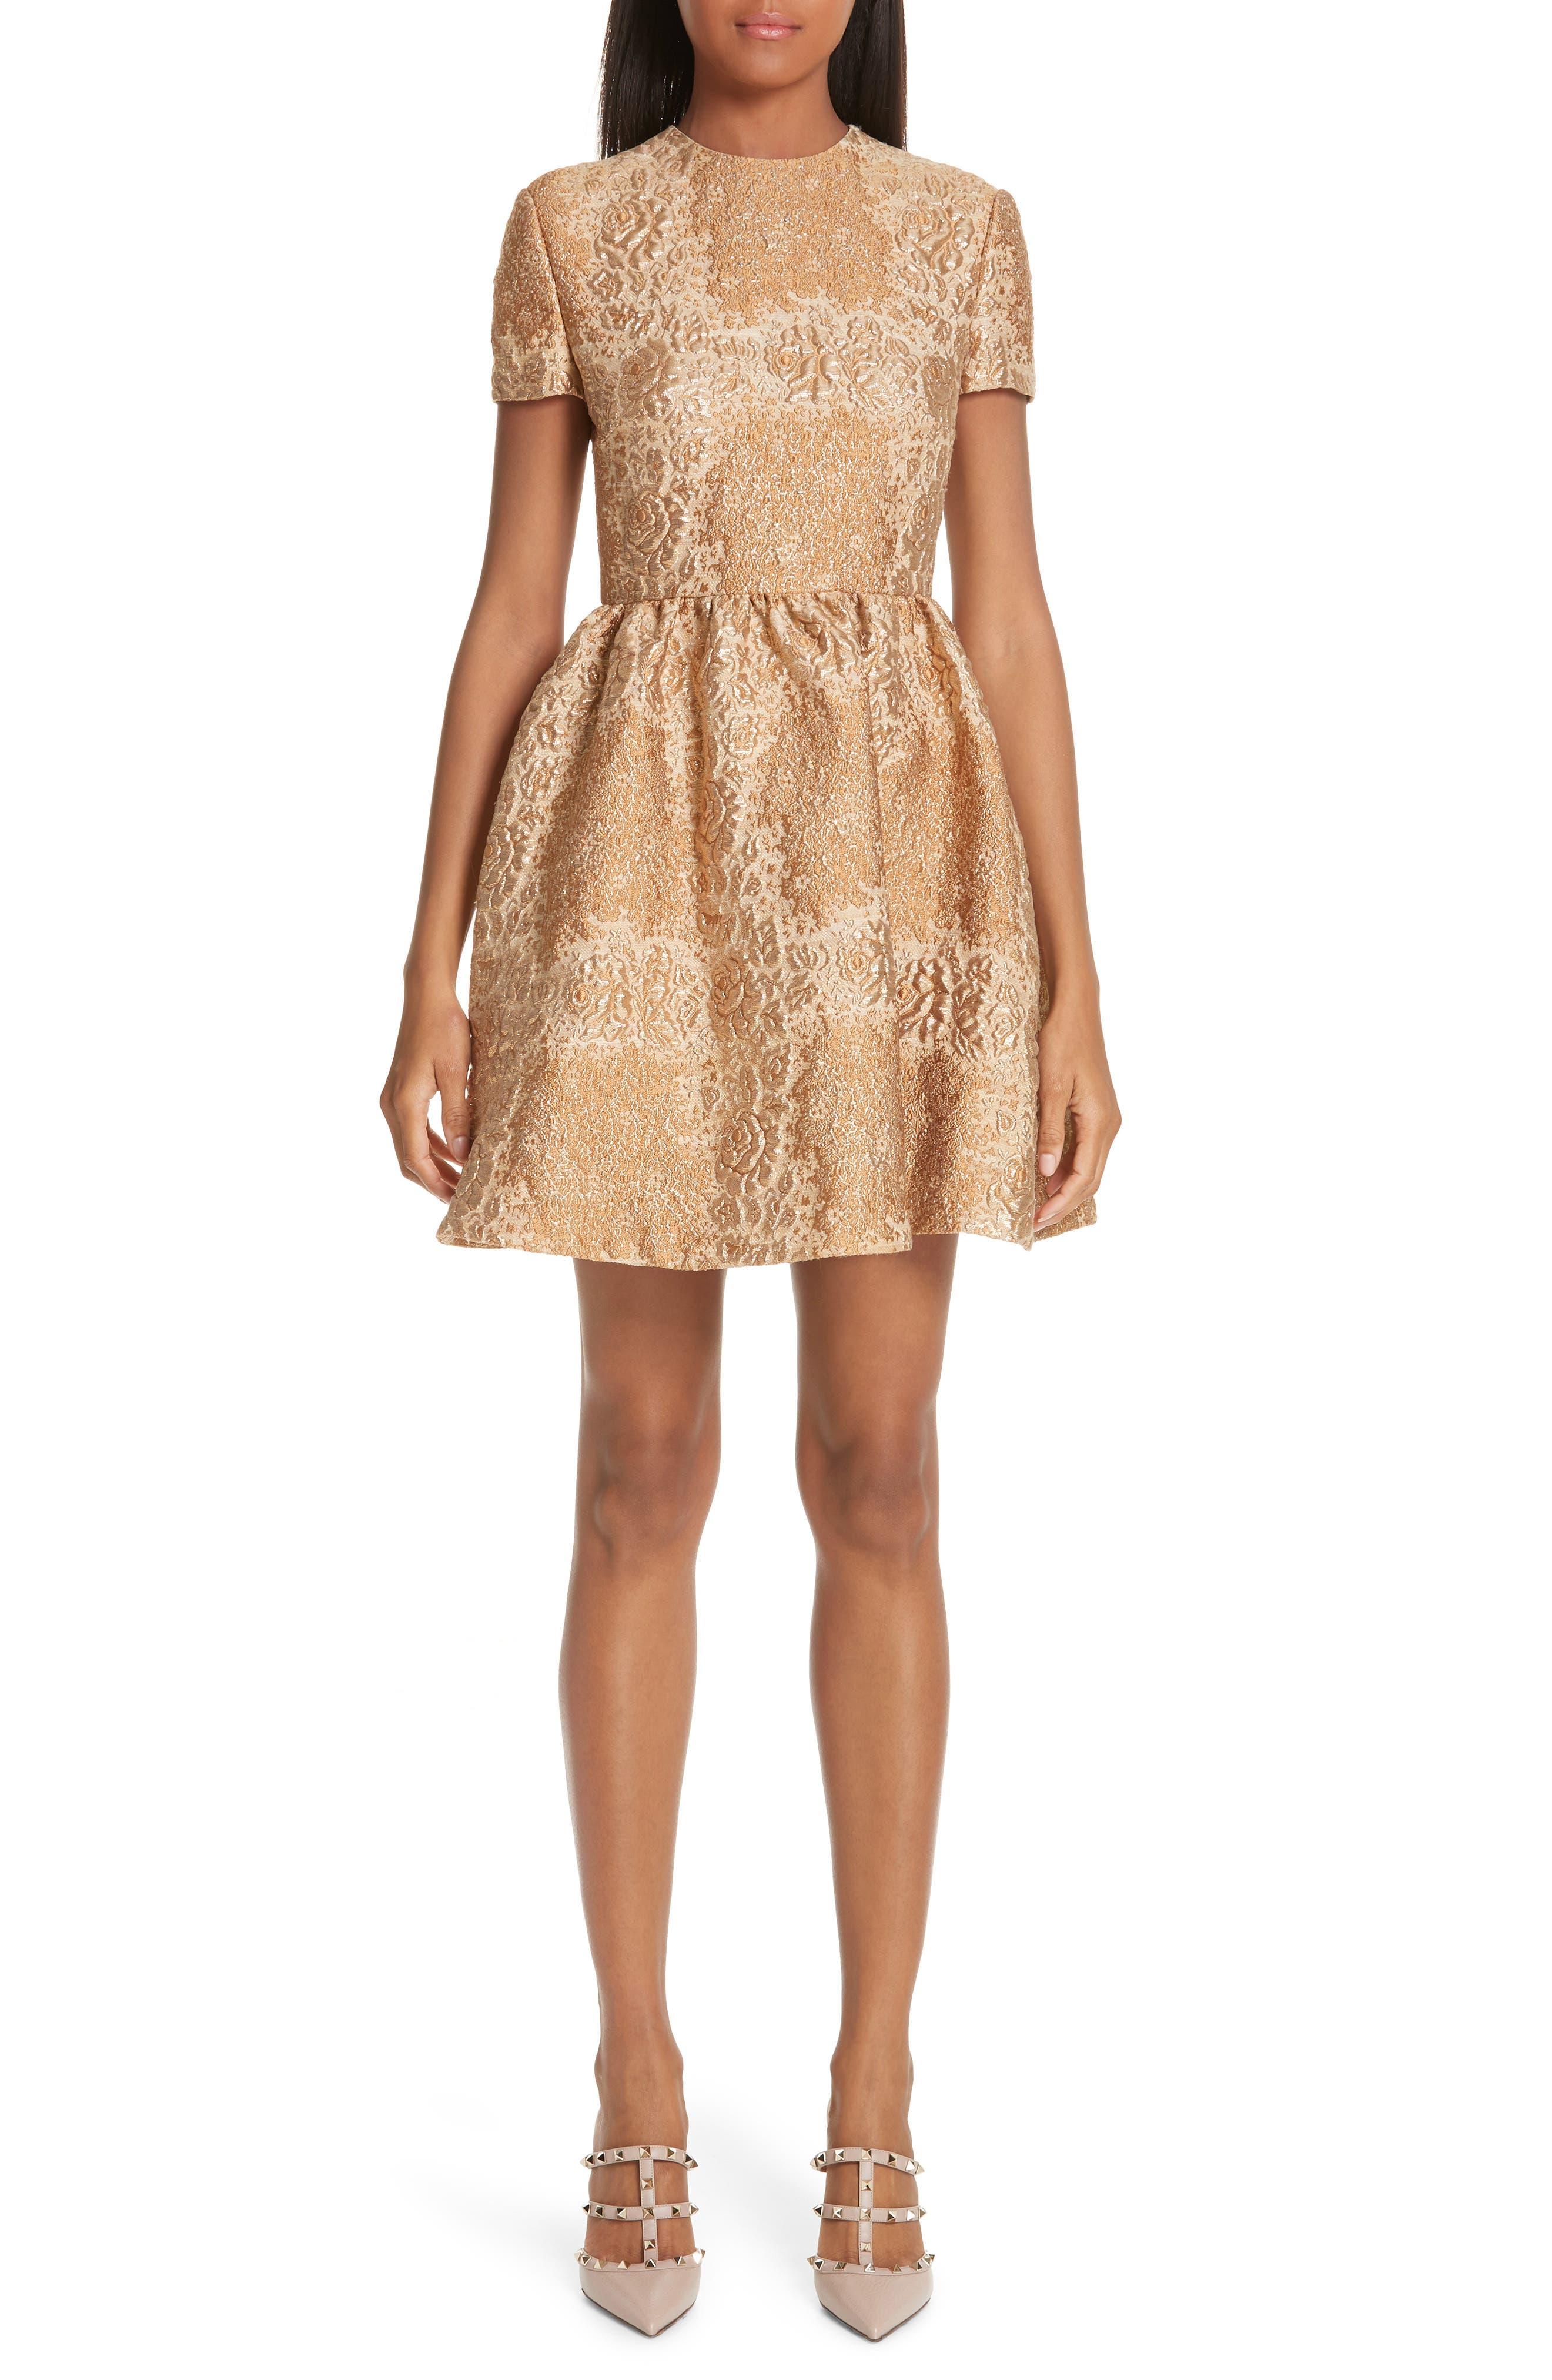 Valentino Floral Metallic Brocade Dress, Metallic